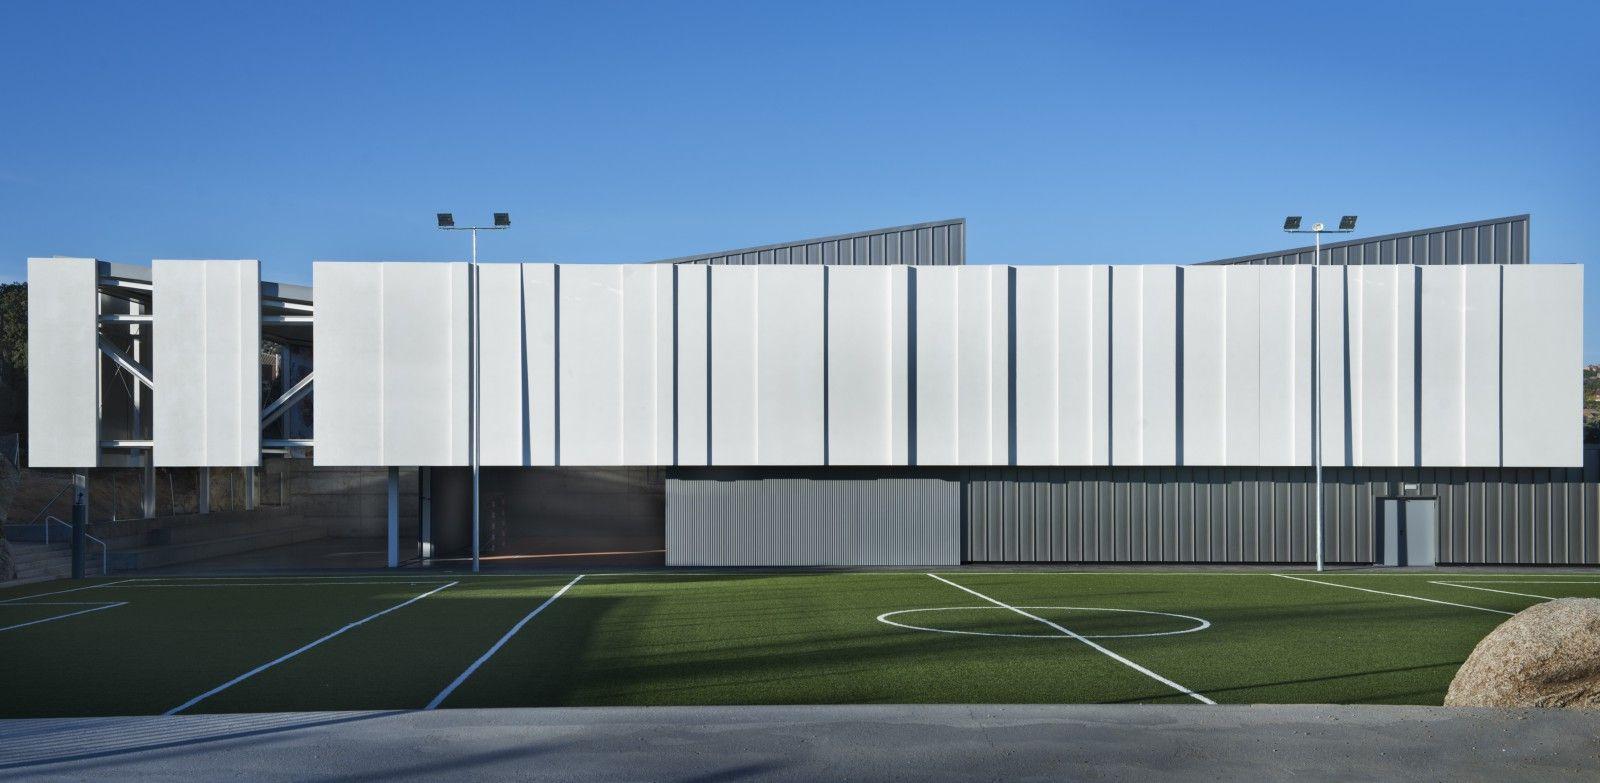 Pabell n de deportes u3 estudio de arquitectura madrid for Estudios de arquitectura en madrid